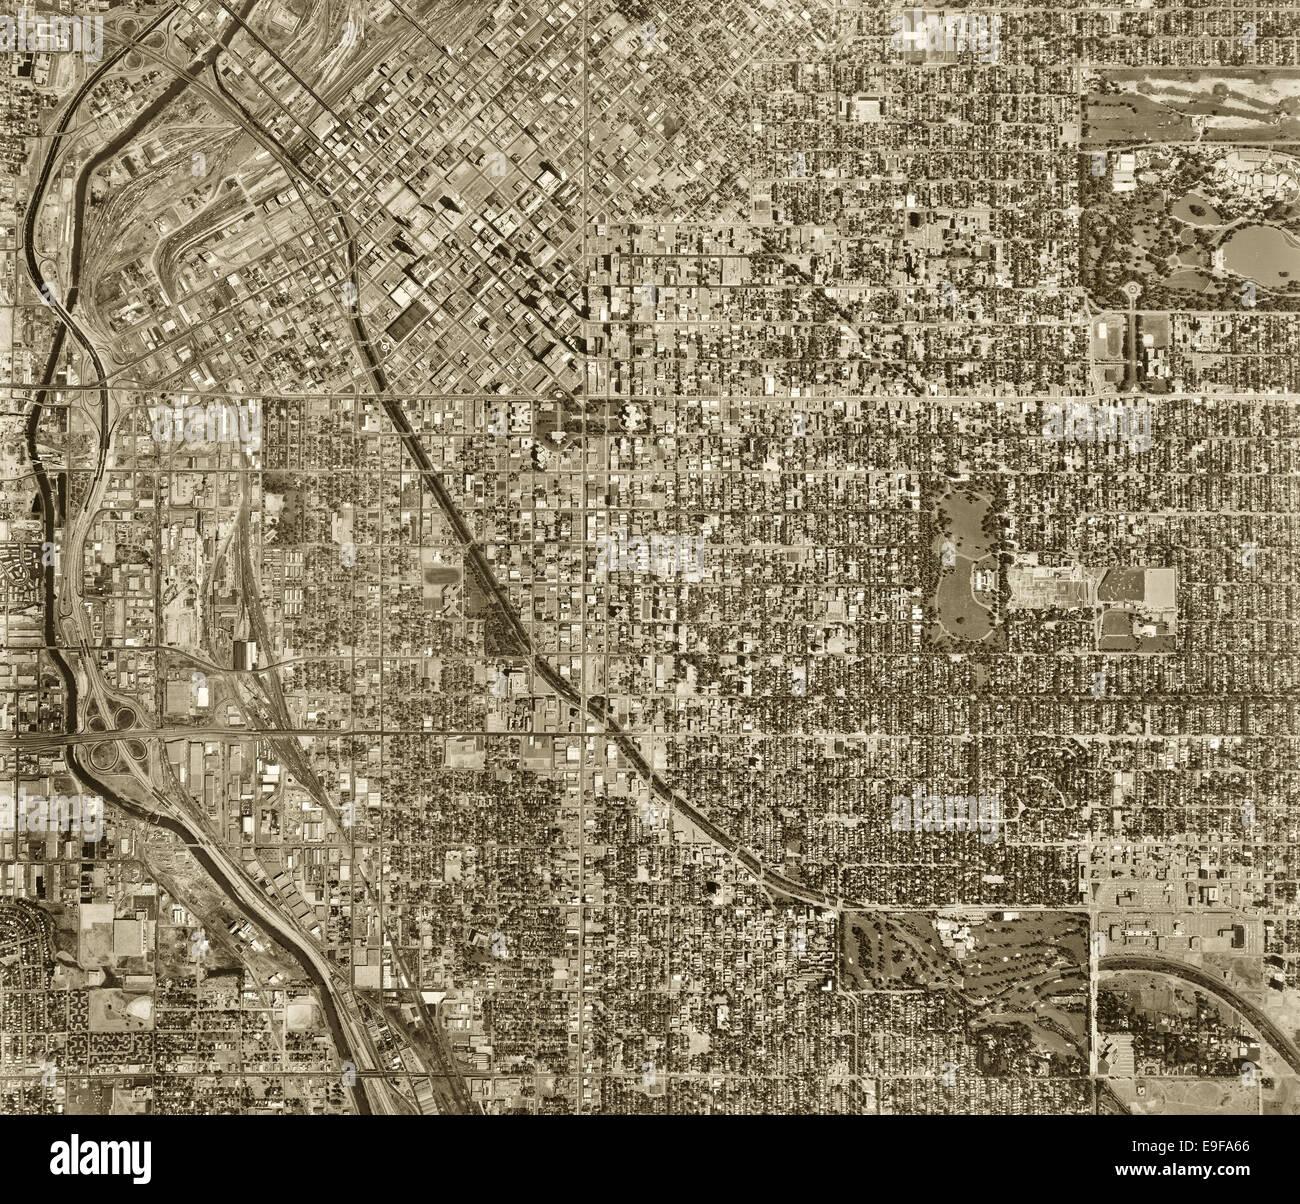 historical aerial photograph Denver, Colorado, 1971 - Stock Image